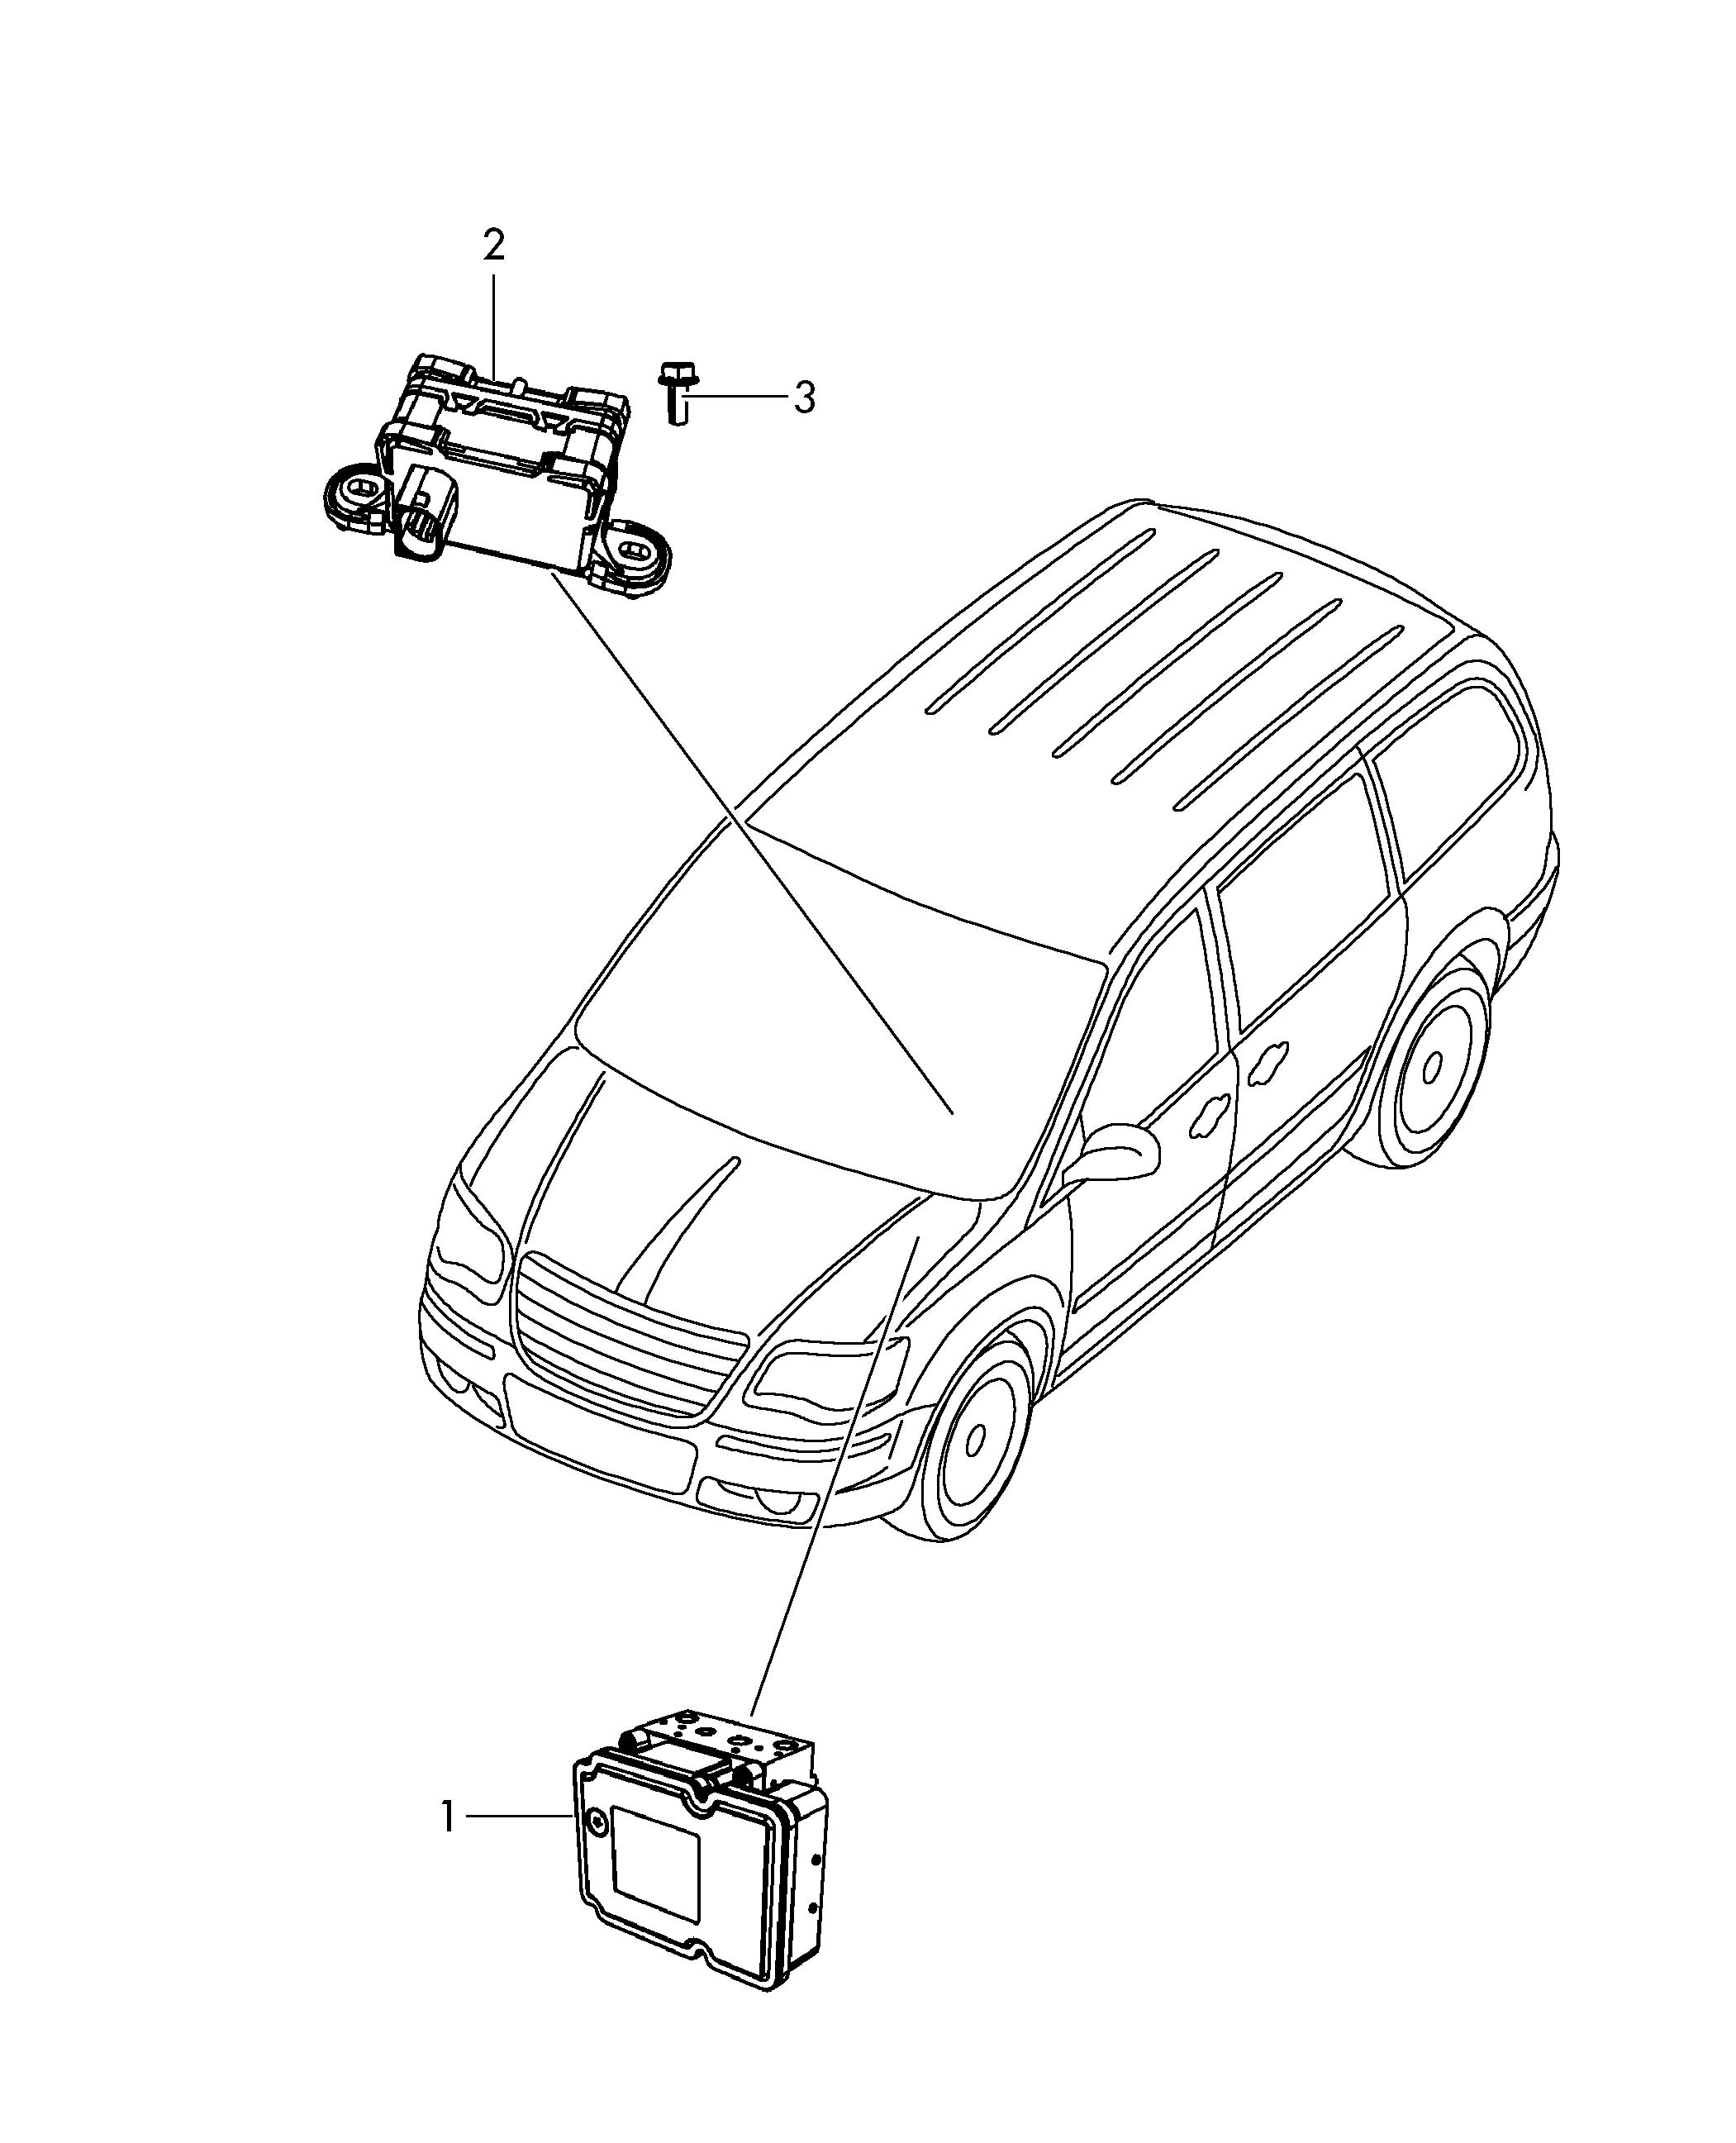 Volkswagen Routan Electronic Control Module Abs Einheit Electronic Stability Programme Esp